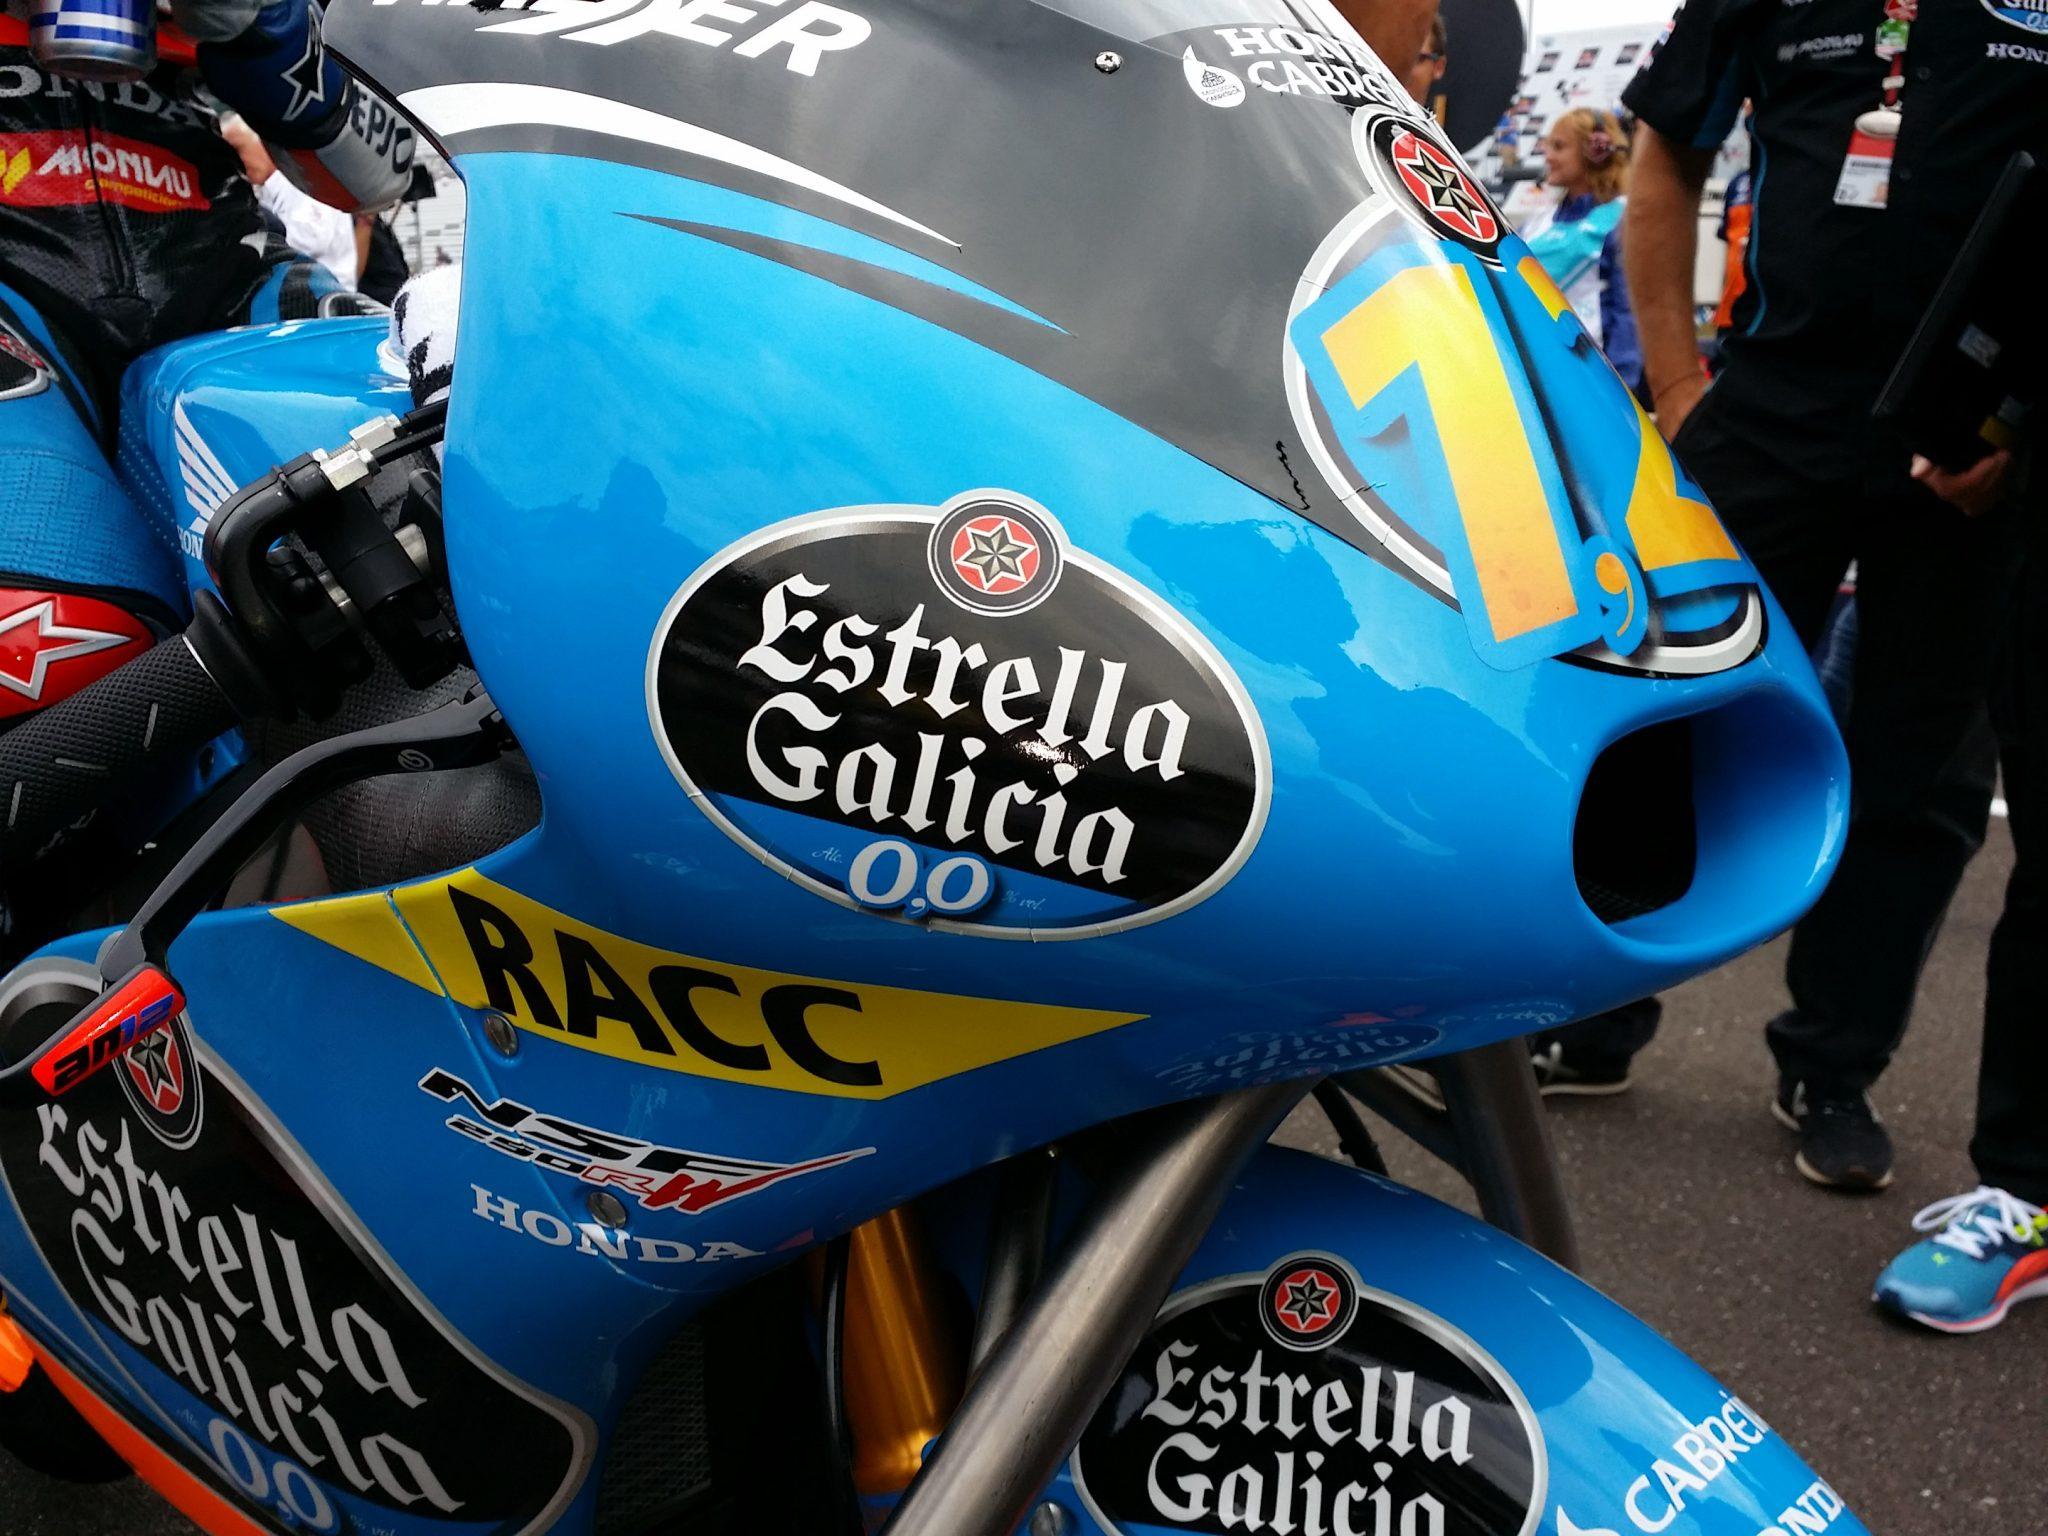 Nonton Motogp Qatar 2014 | MotoGP 2017 Info, Video, Points Table